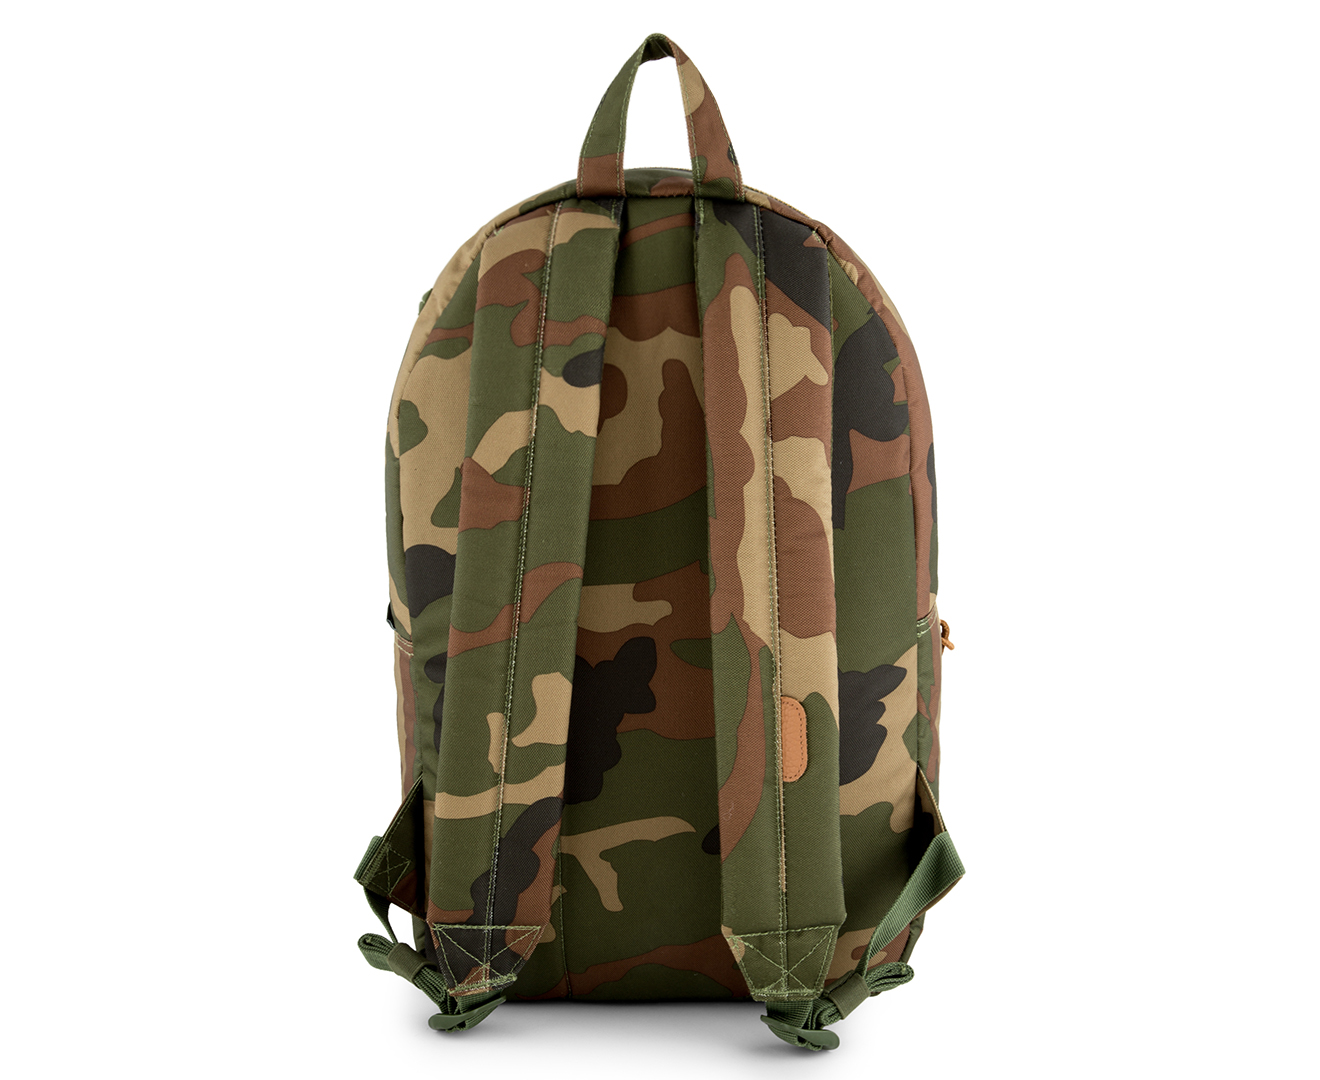 e6f37be9c8e Herschel Supply Co. 23L Settlement Backpack - Woodland Camo ...